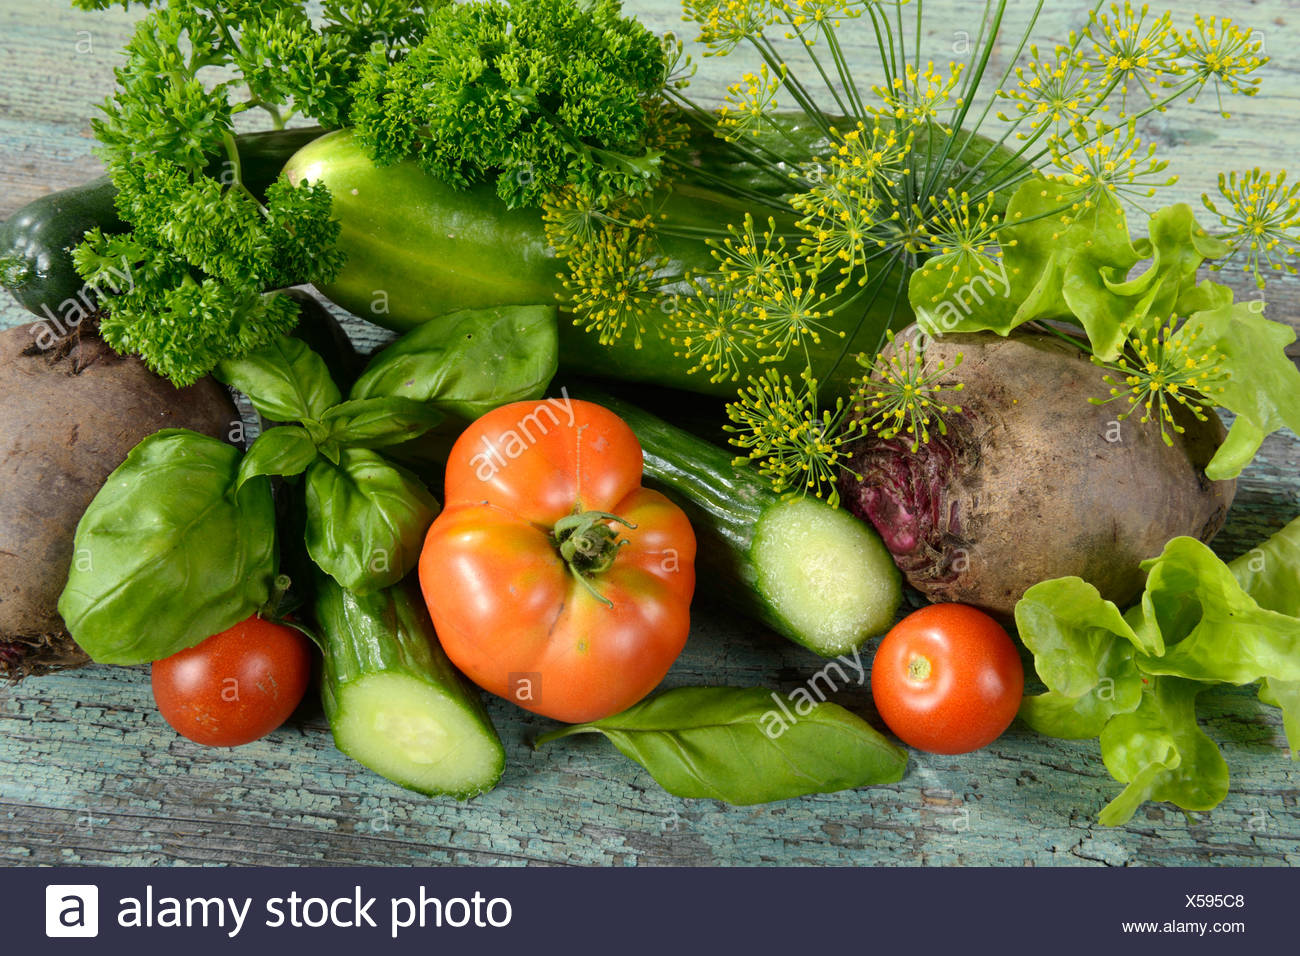 Several vegetables - Stock Image